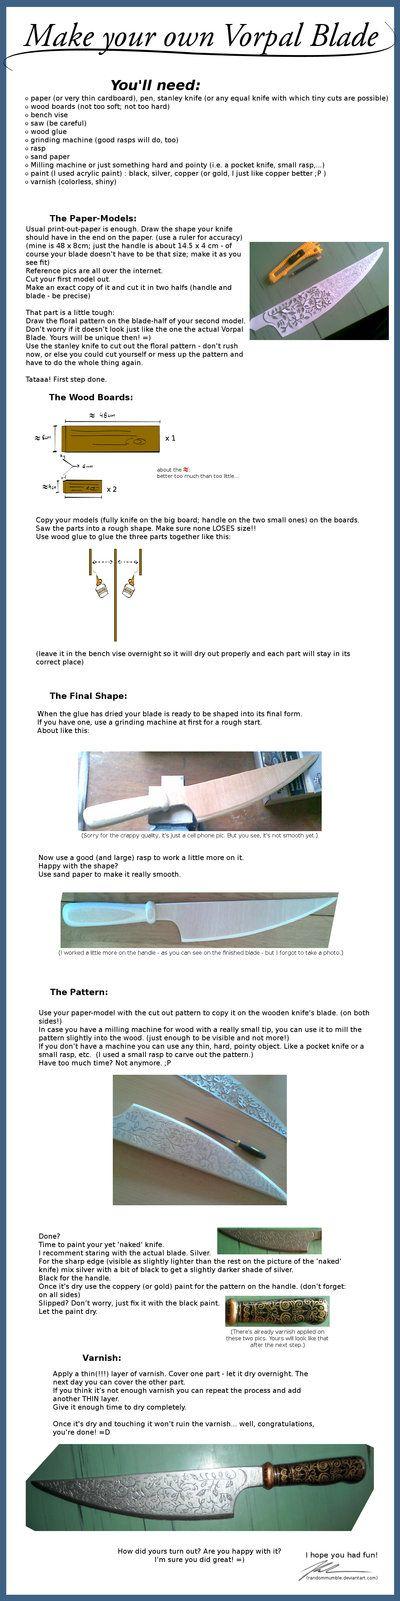 Vorpal Blade Mini-Tutorial by RandomMumble on deviantART